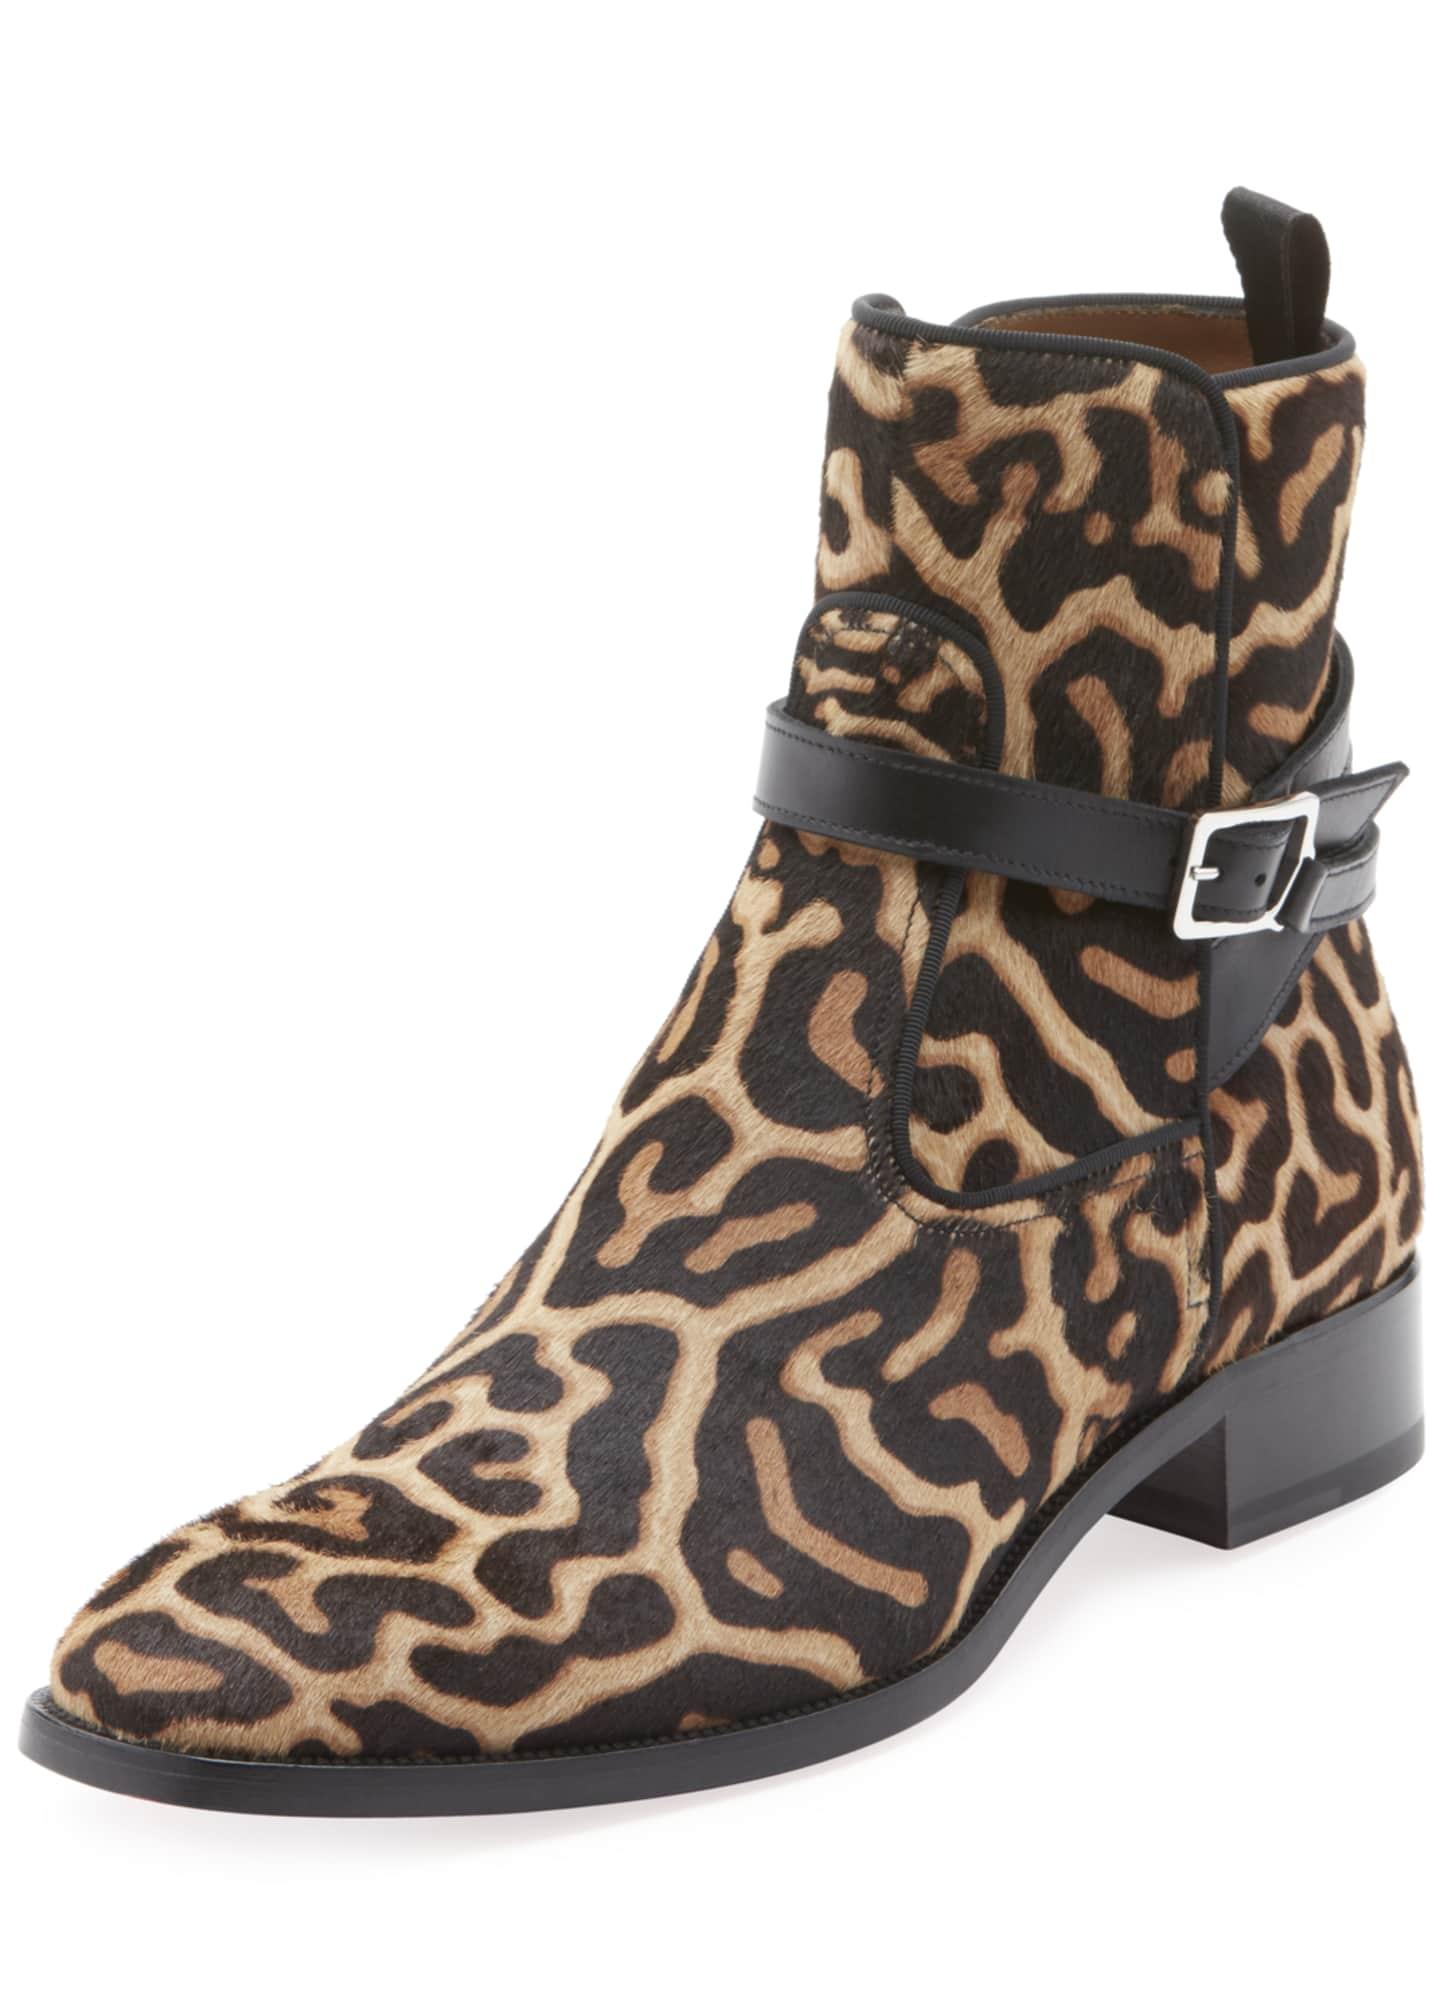 Christian Louboutin Men's Kicko High-Top Leopard-Print Pony Hair